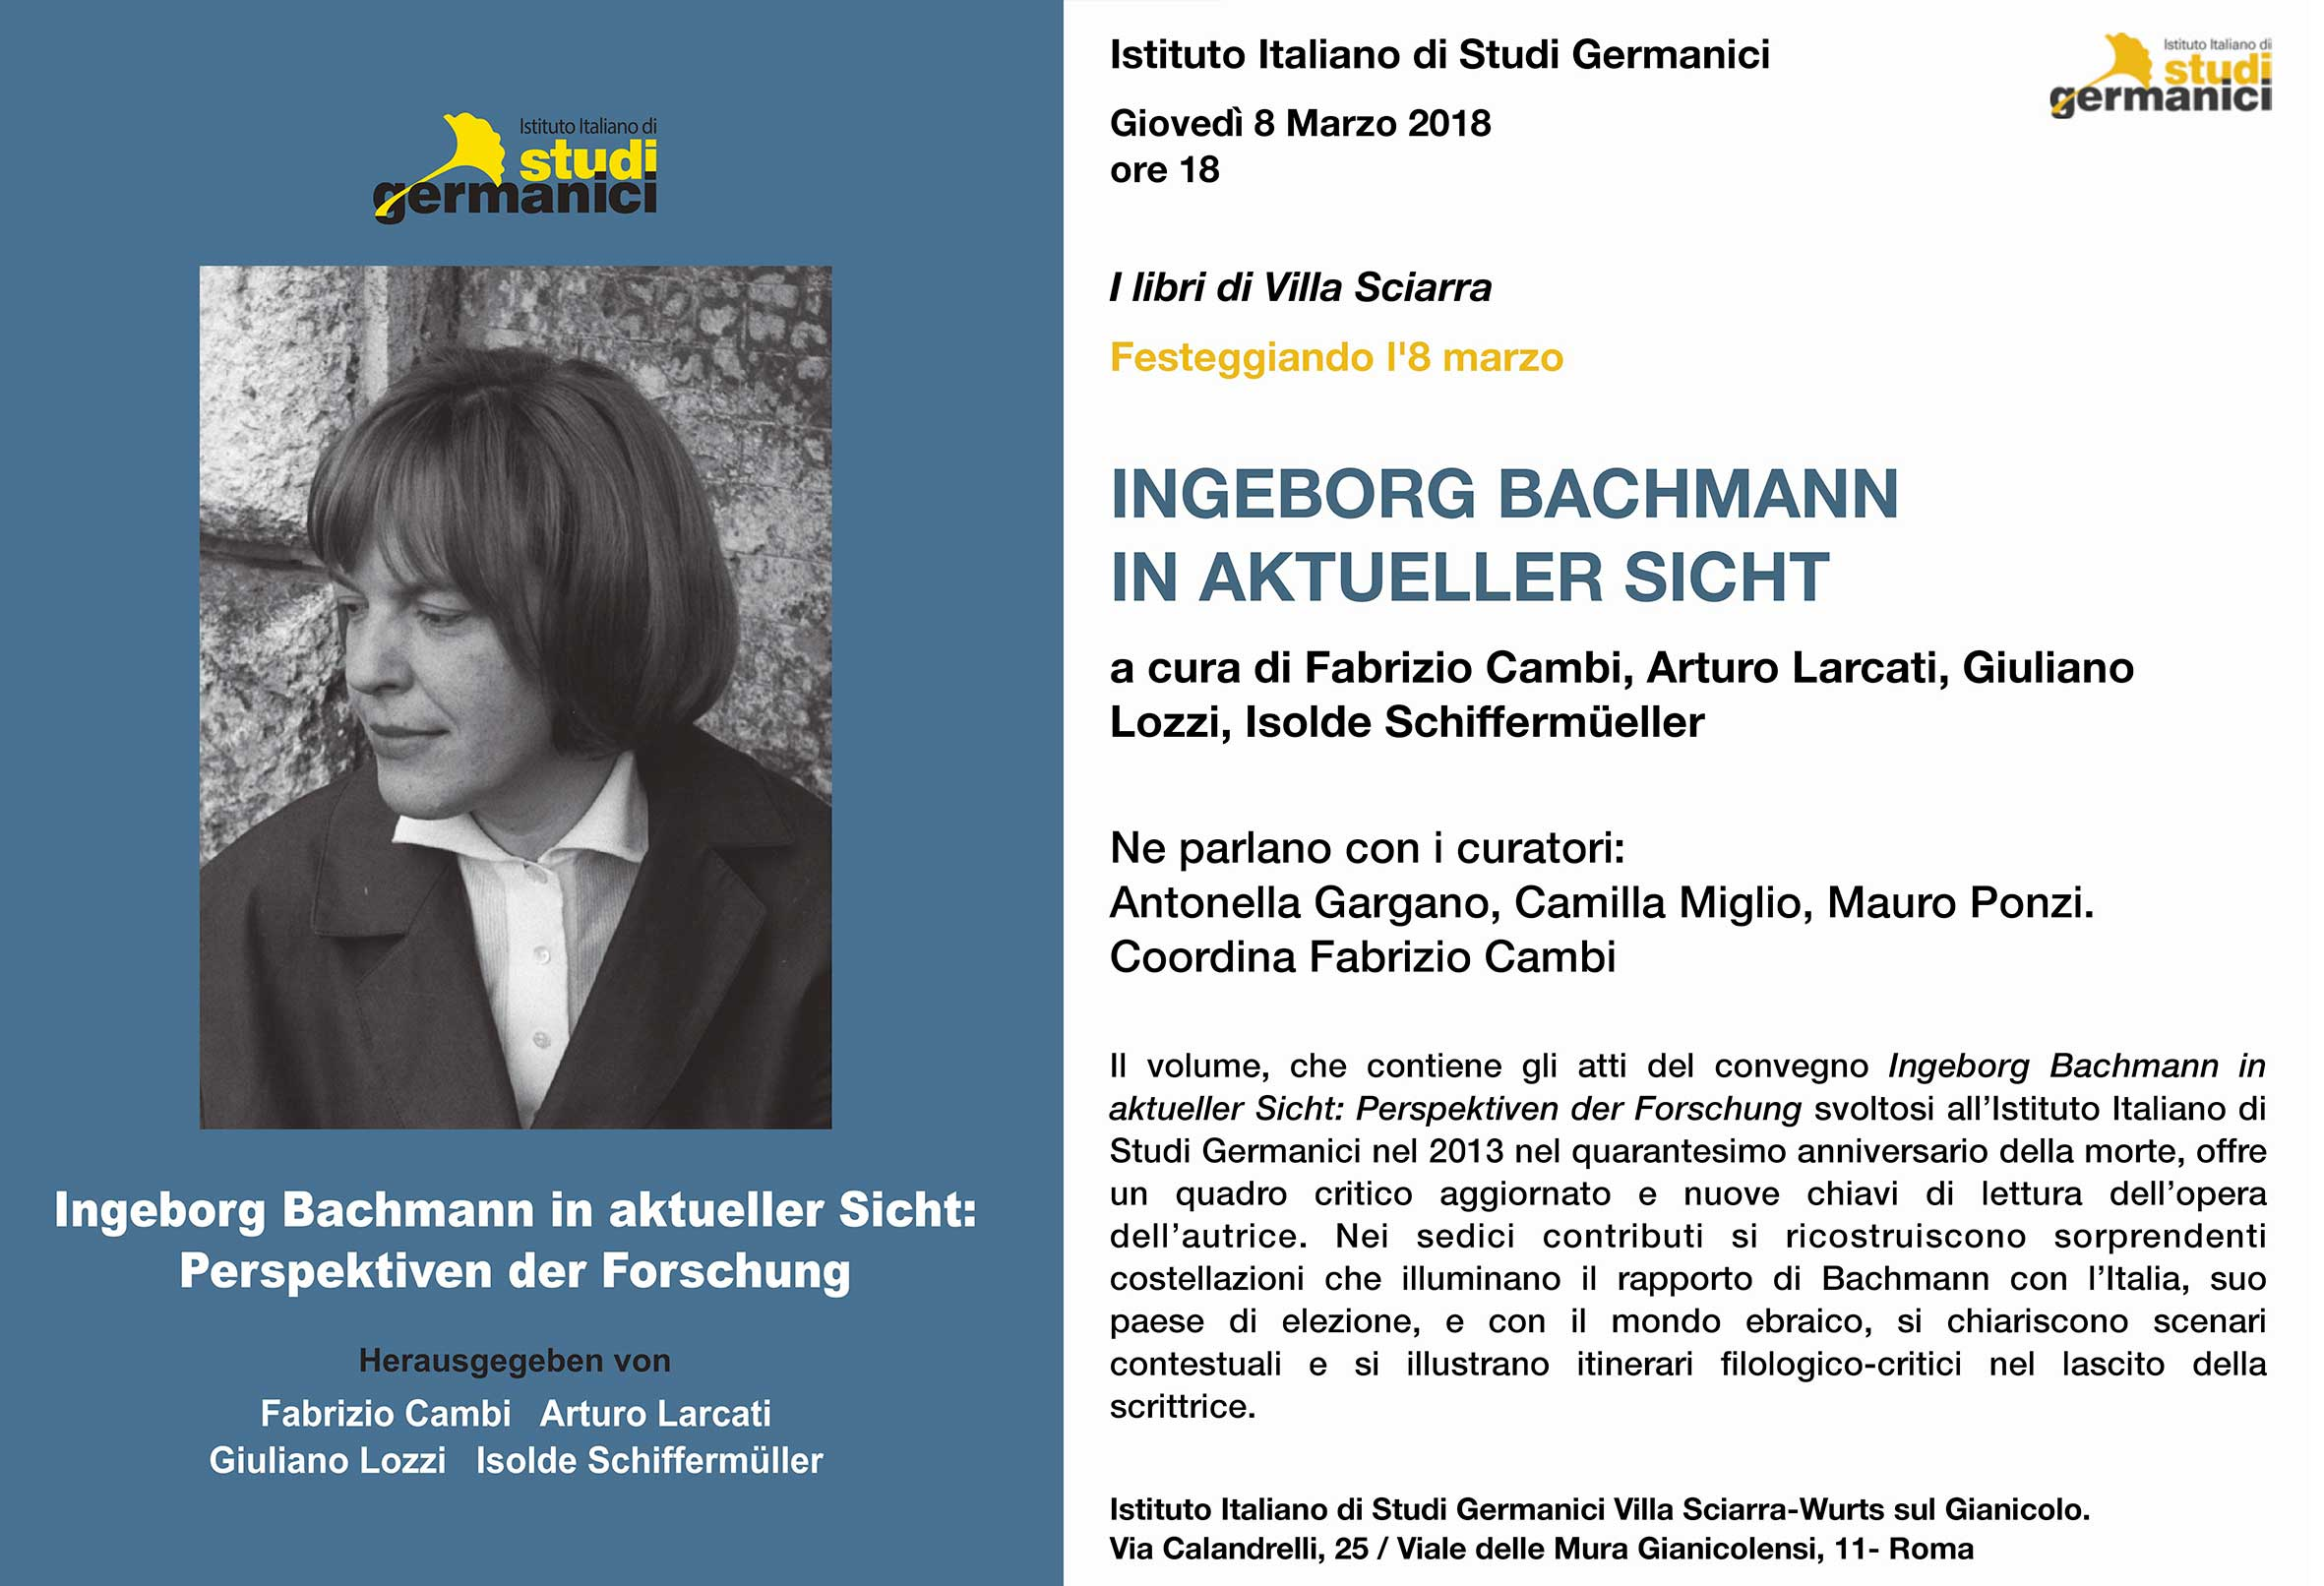 ingeborgbachmann